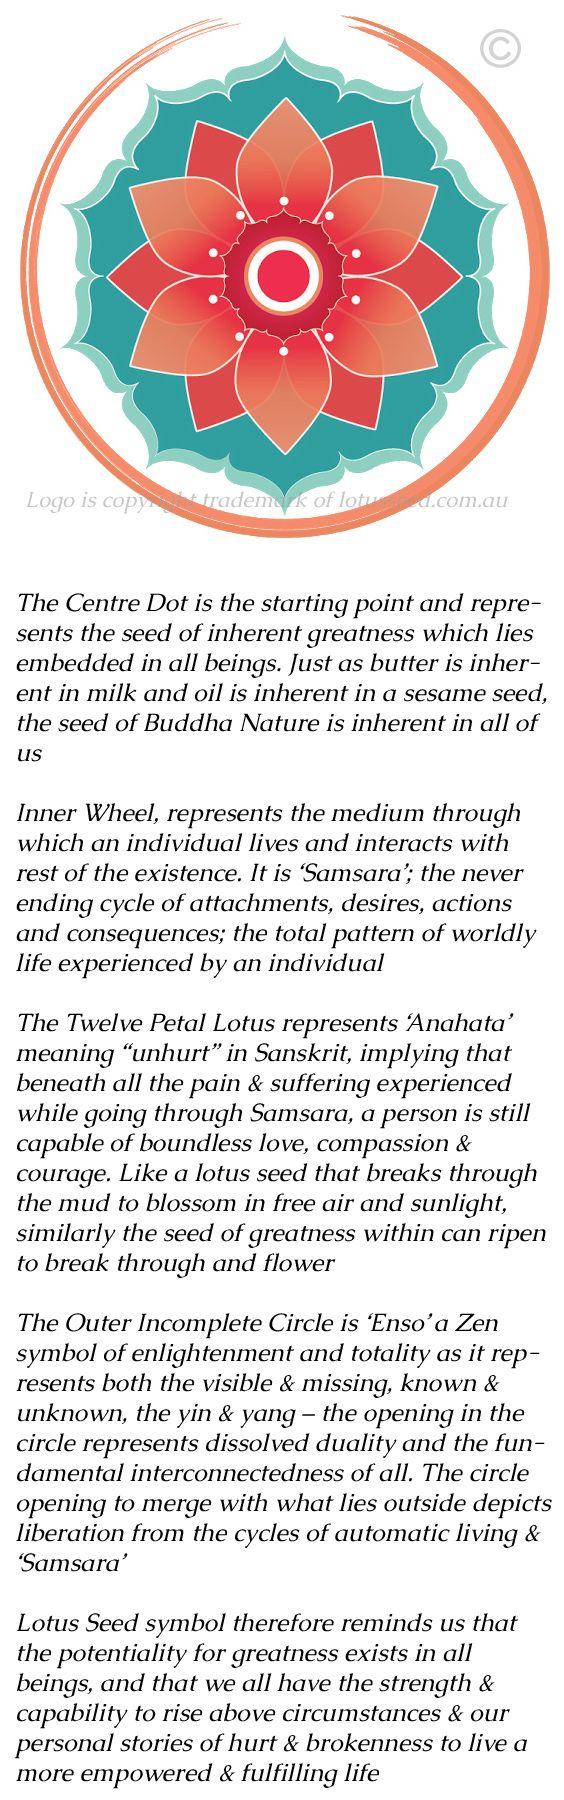 Lotus seed lotusseed mandala logo meaning meditatiom lotus seed lotusseed mandala logo meaning izmirmasajfo